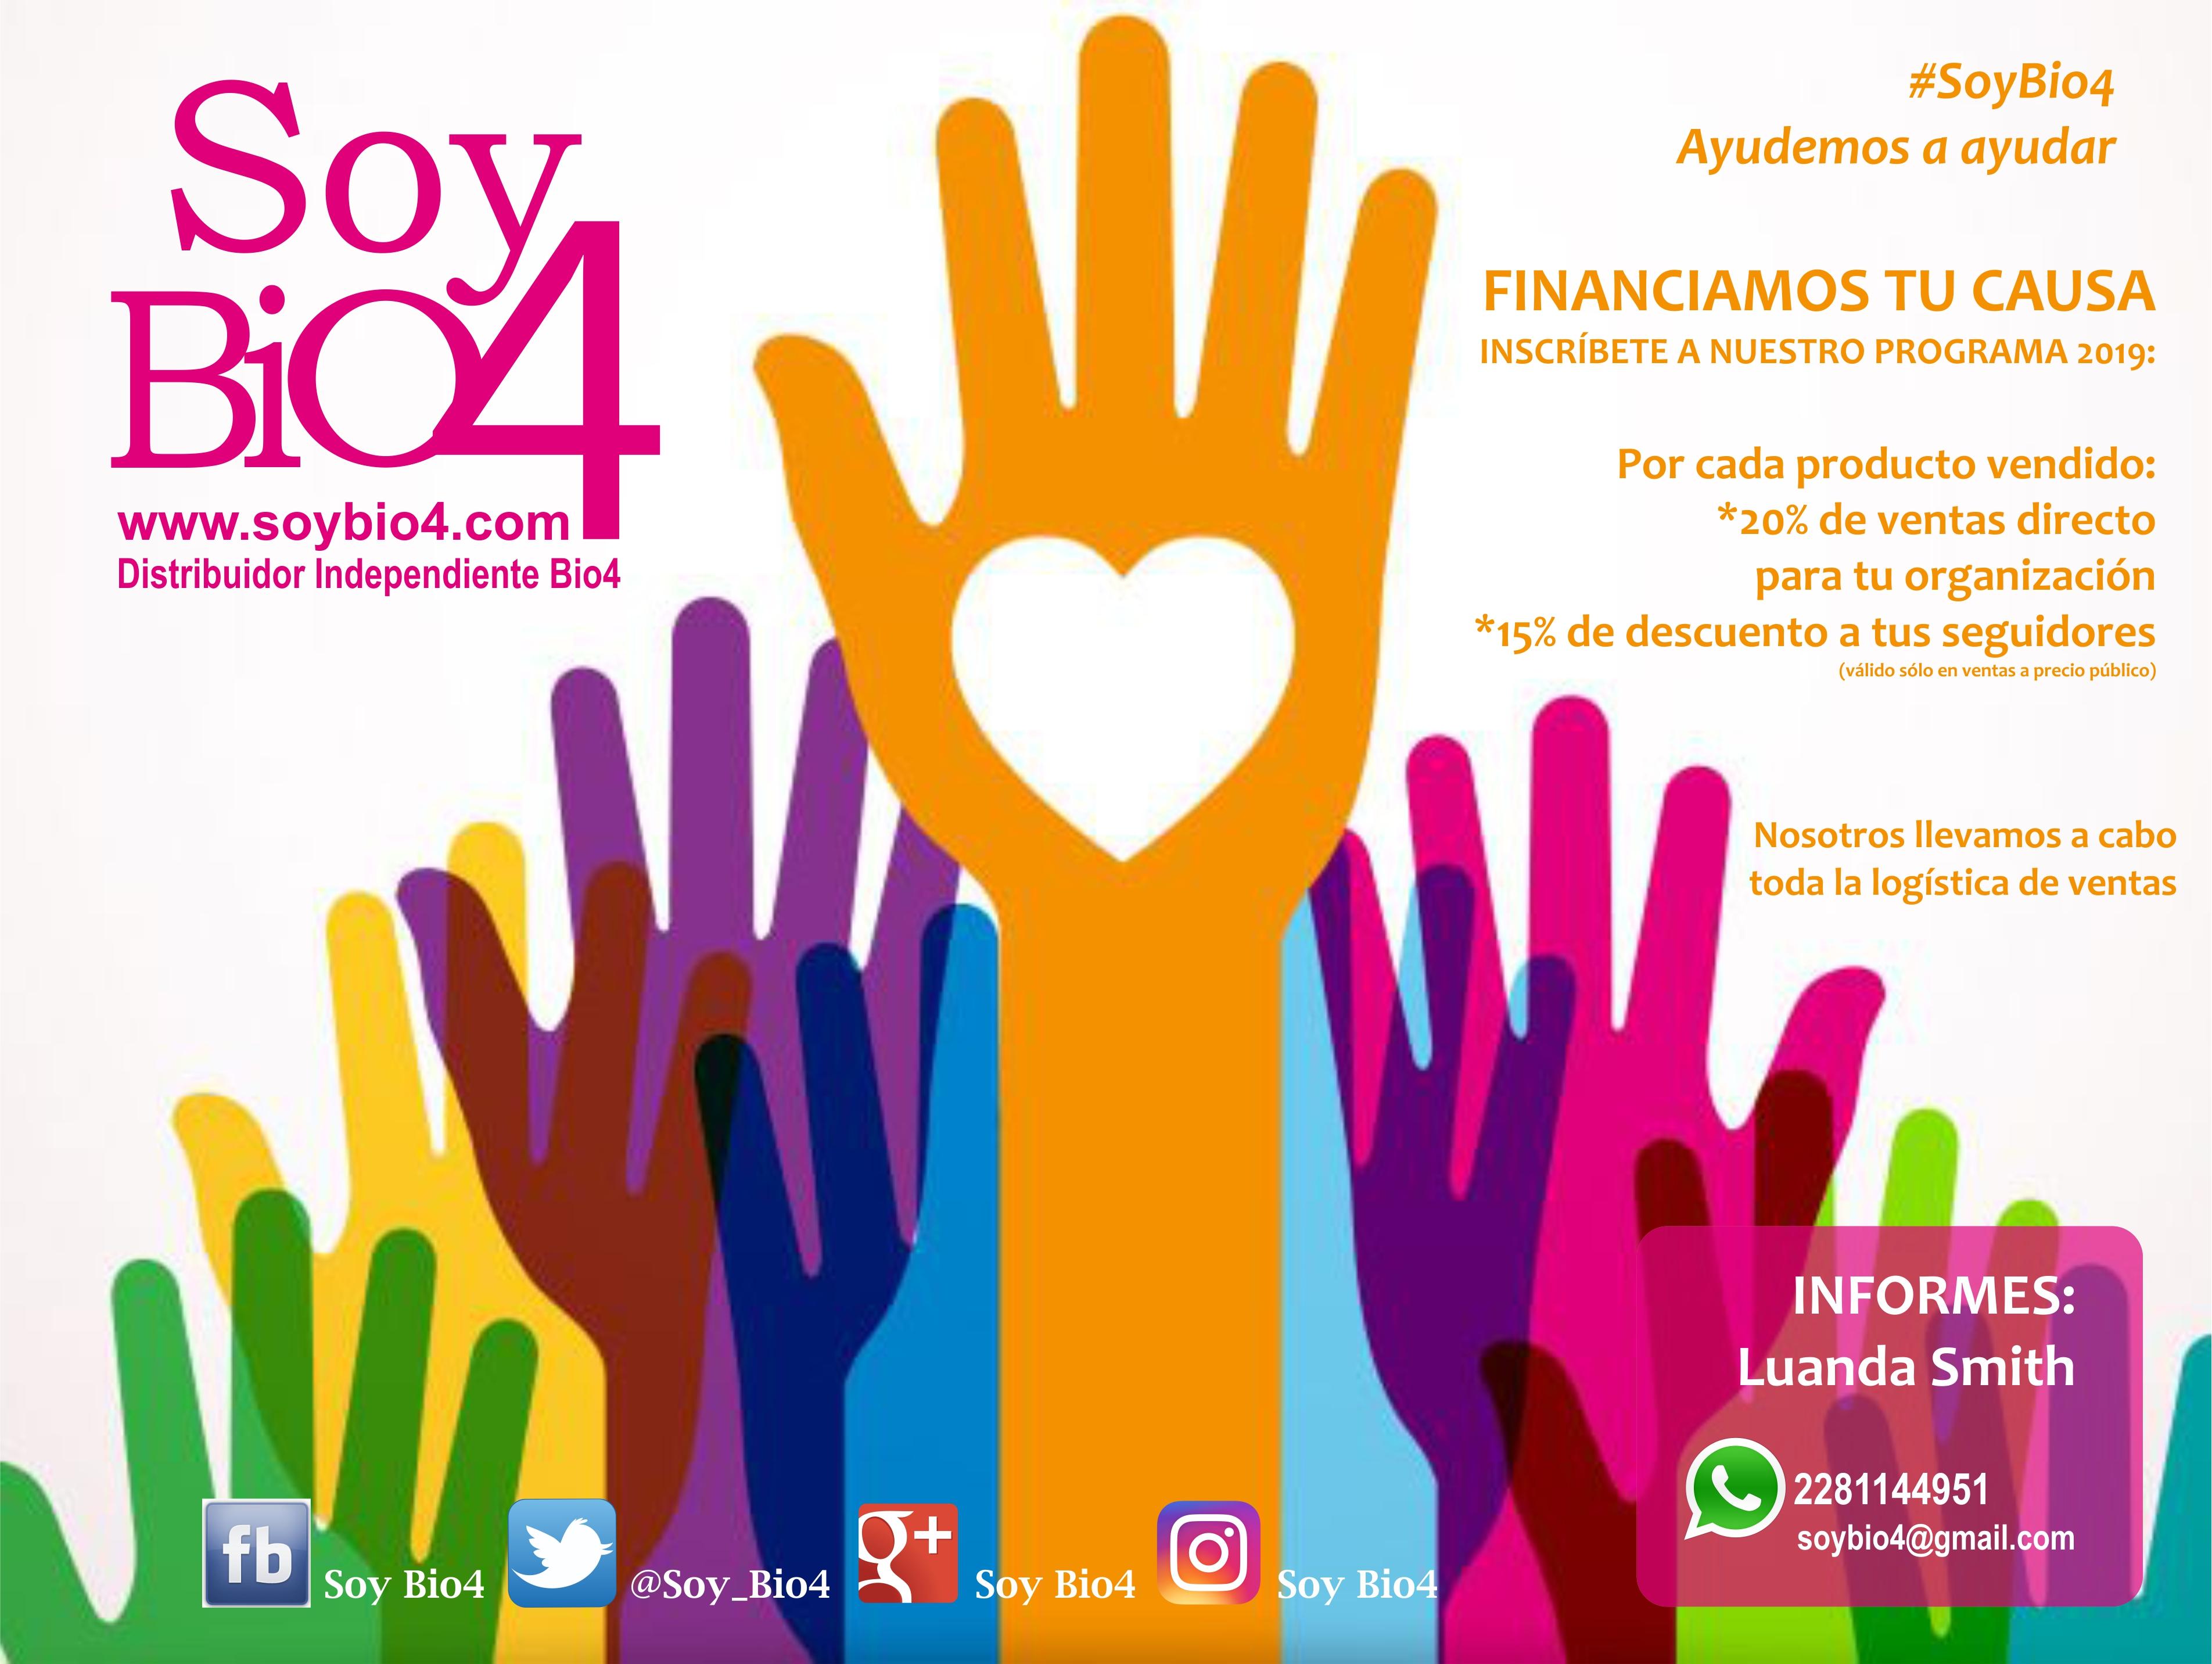 Social Soy Bio4